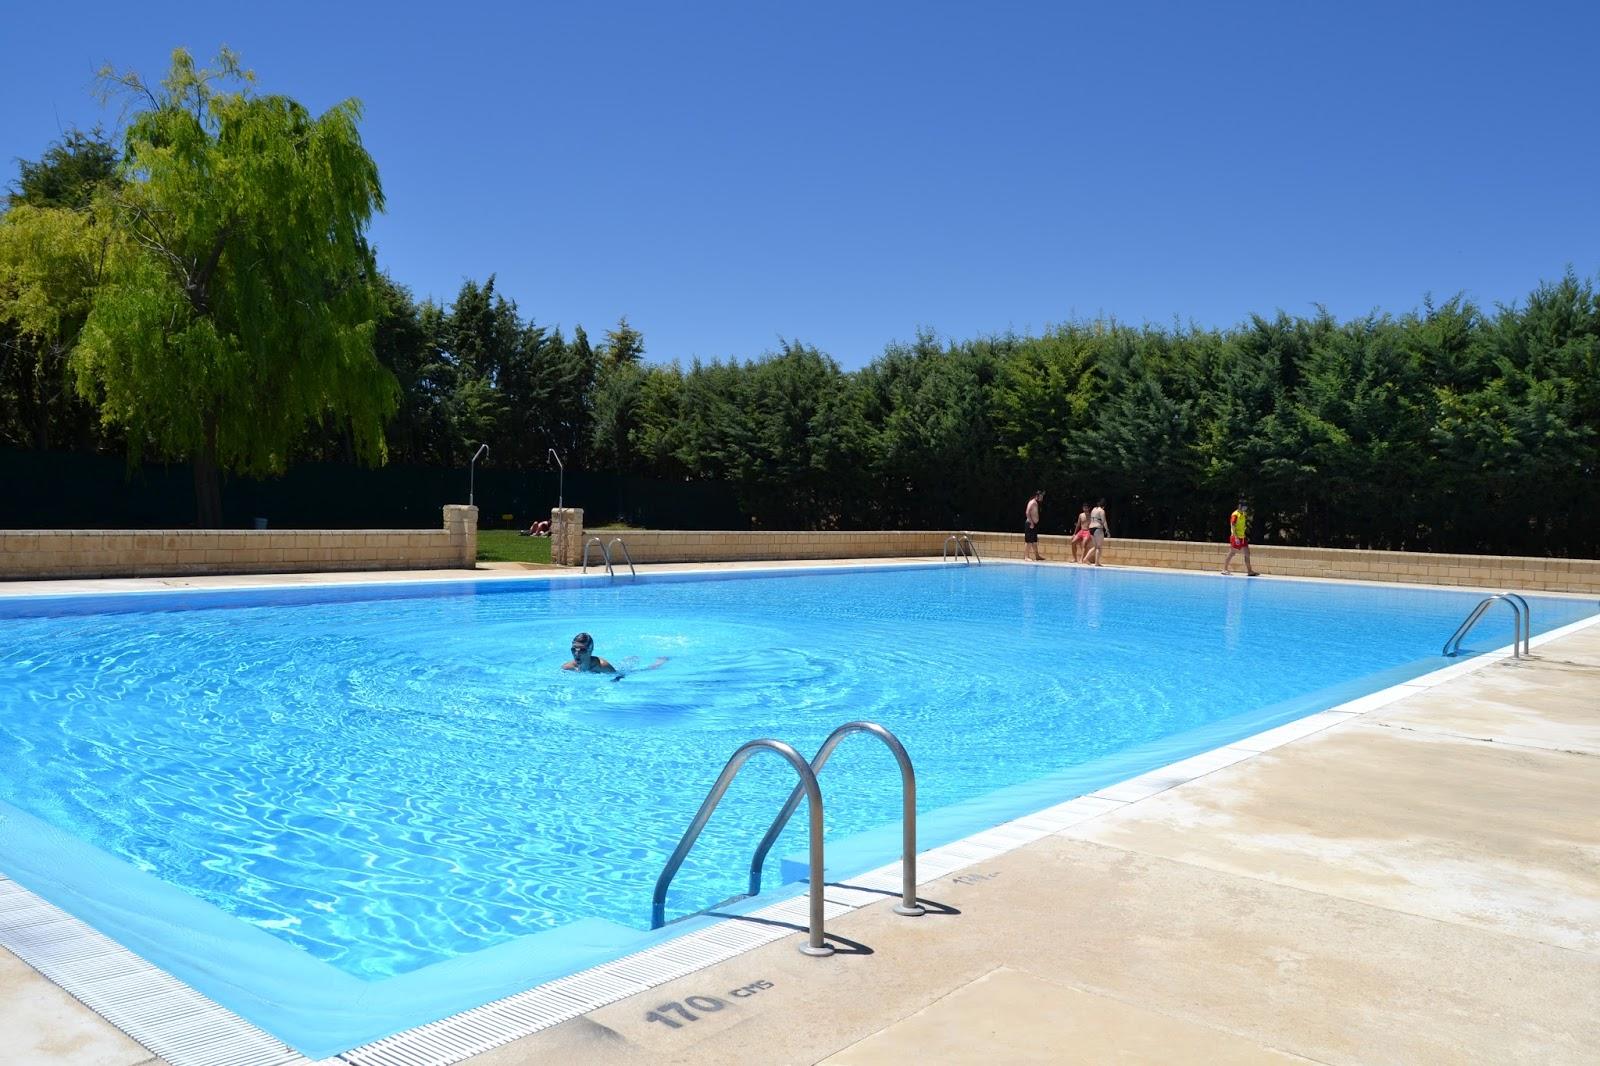 Turismo astudillo apertura de las piscinas municipales for Piscinas palencia